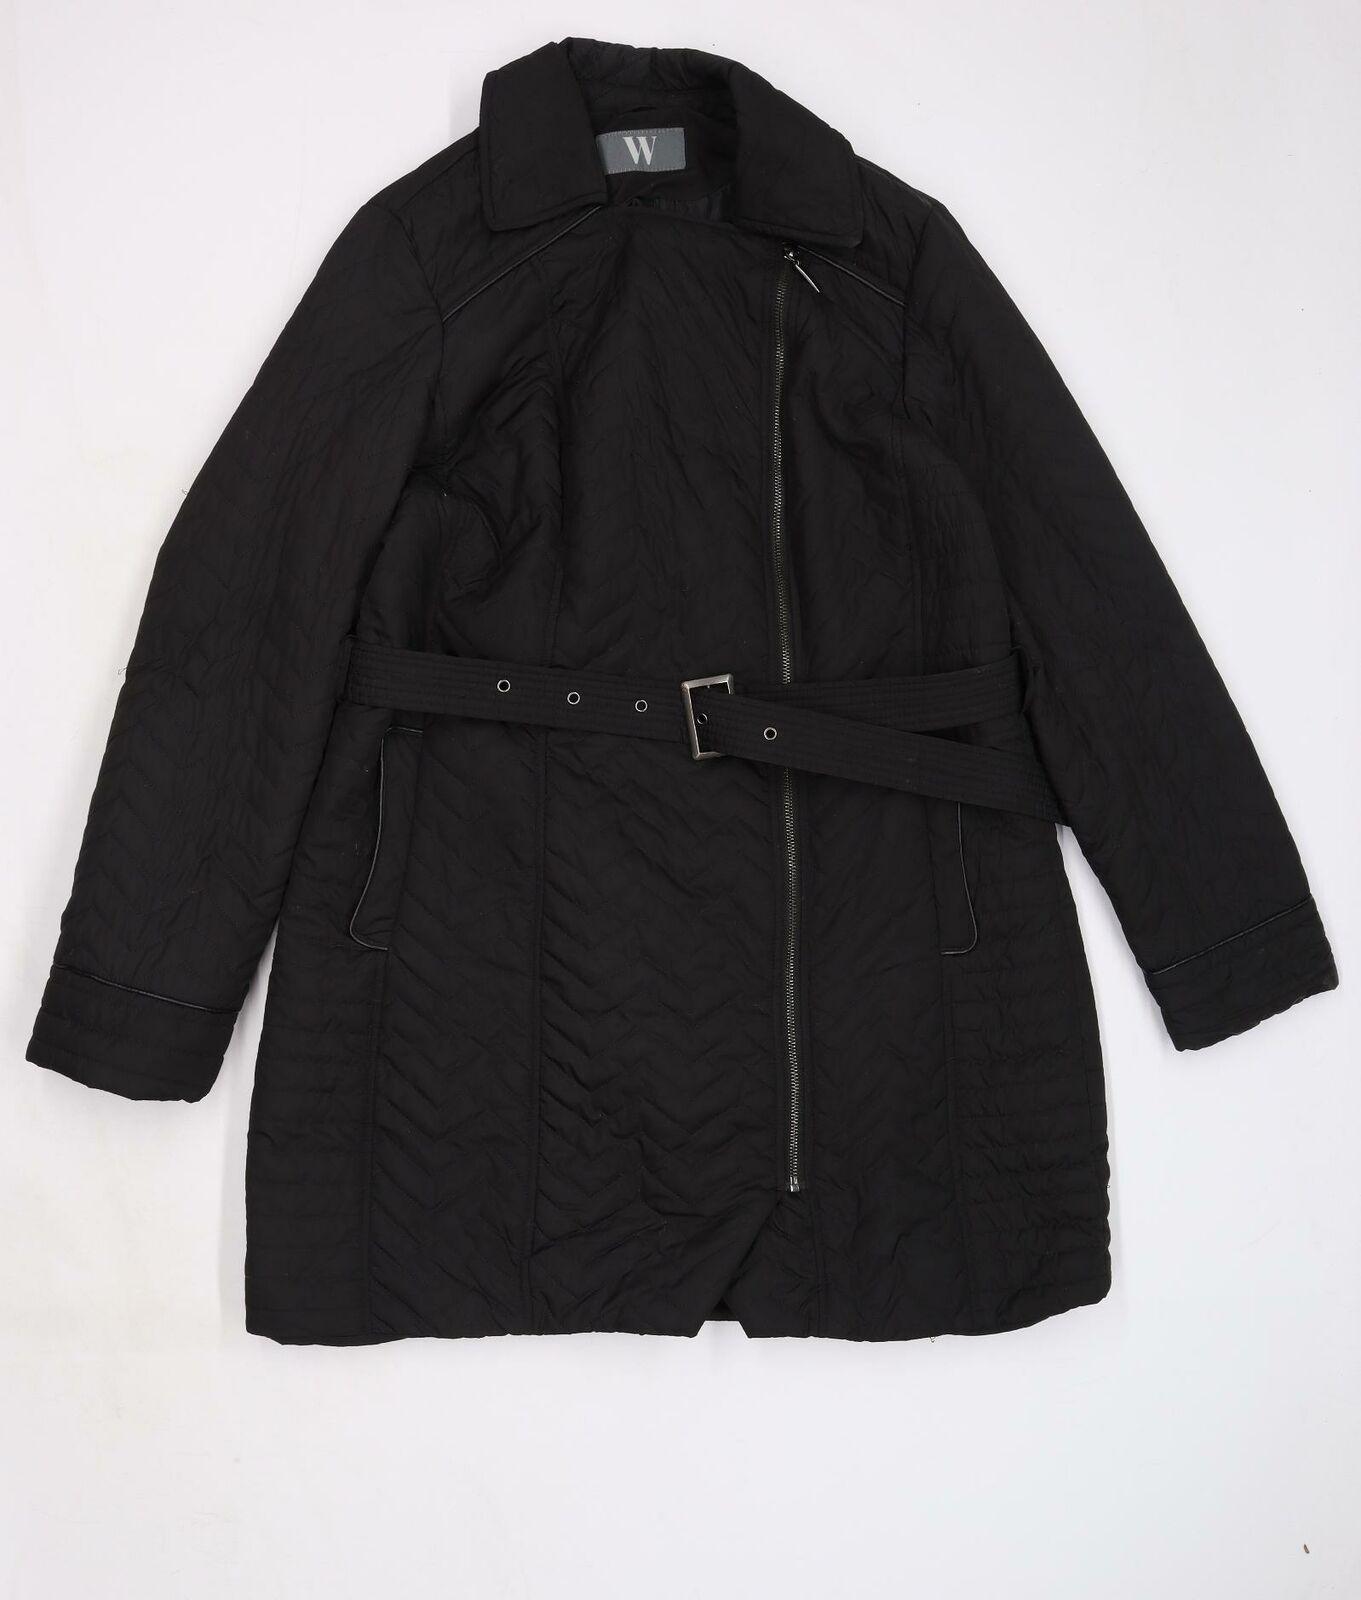 BHS Womens Black Overcoat Coat Size 16